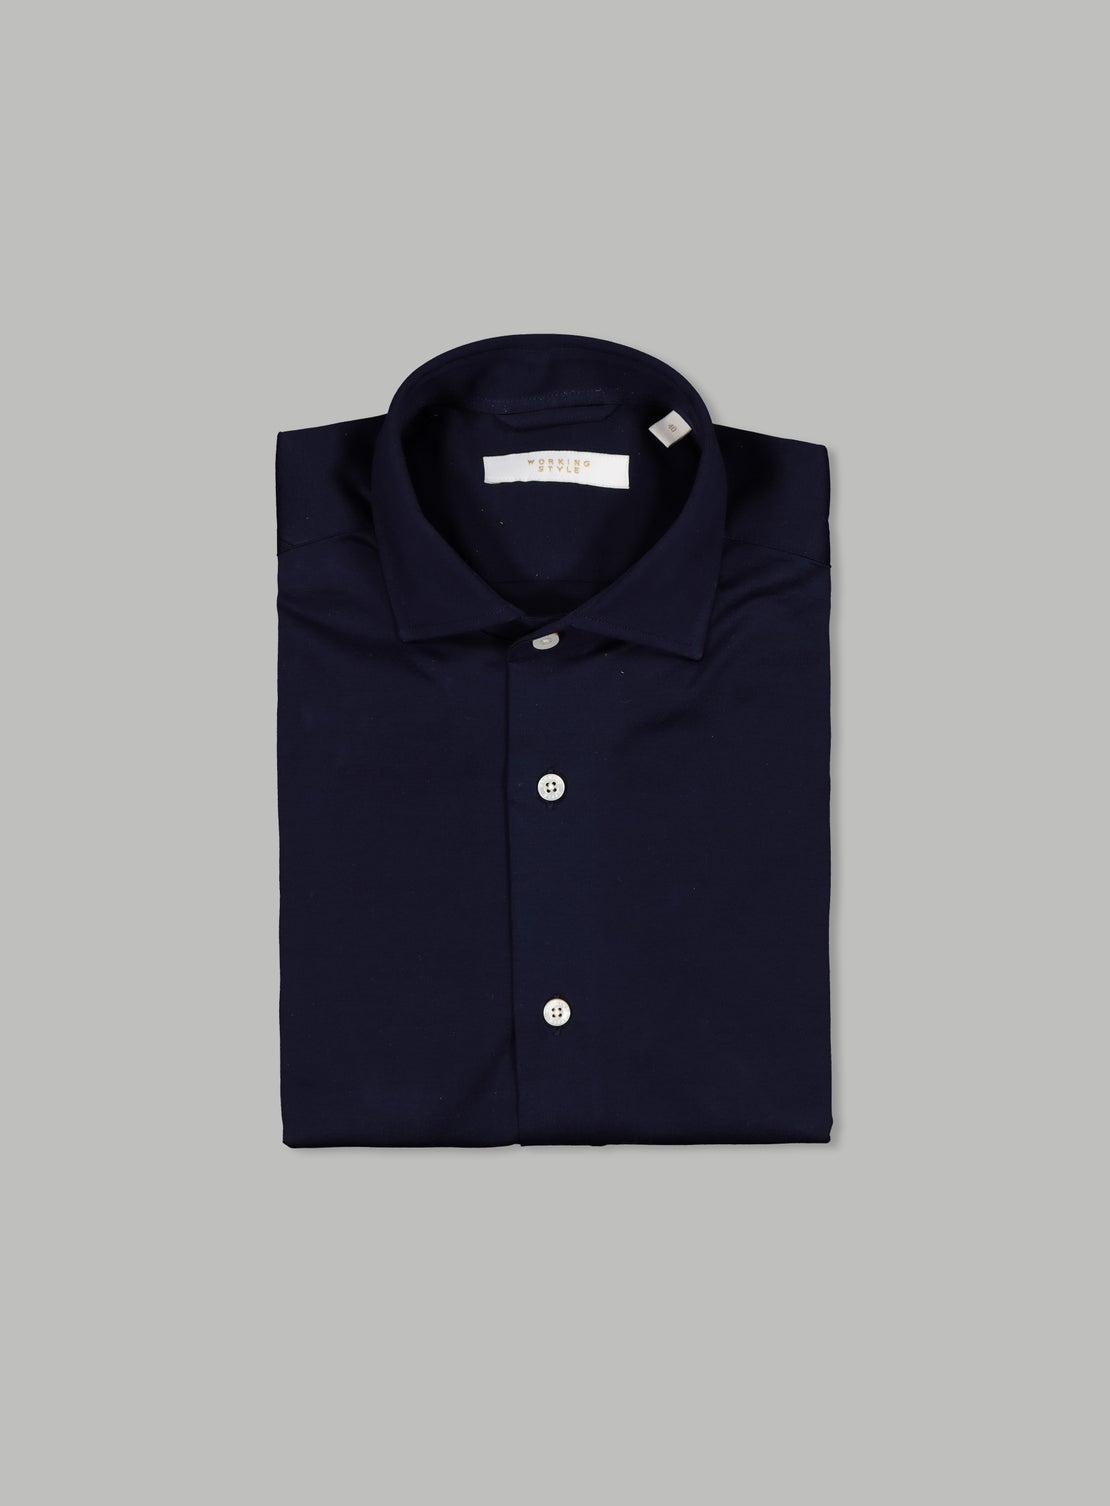 Piero Navy Short Sleeve Shirt